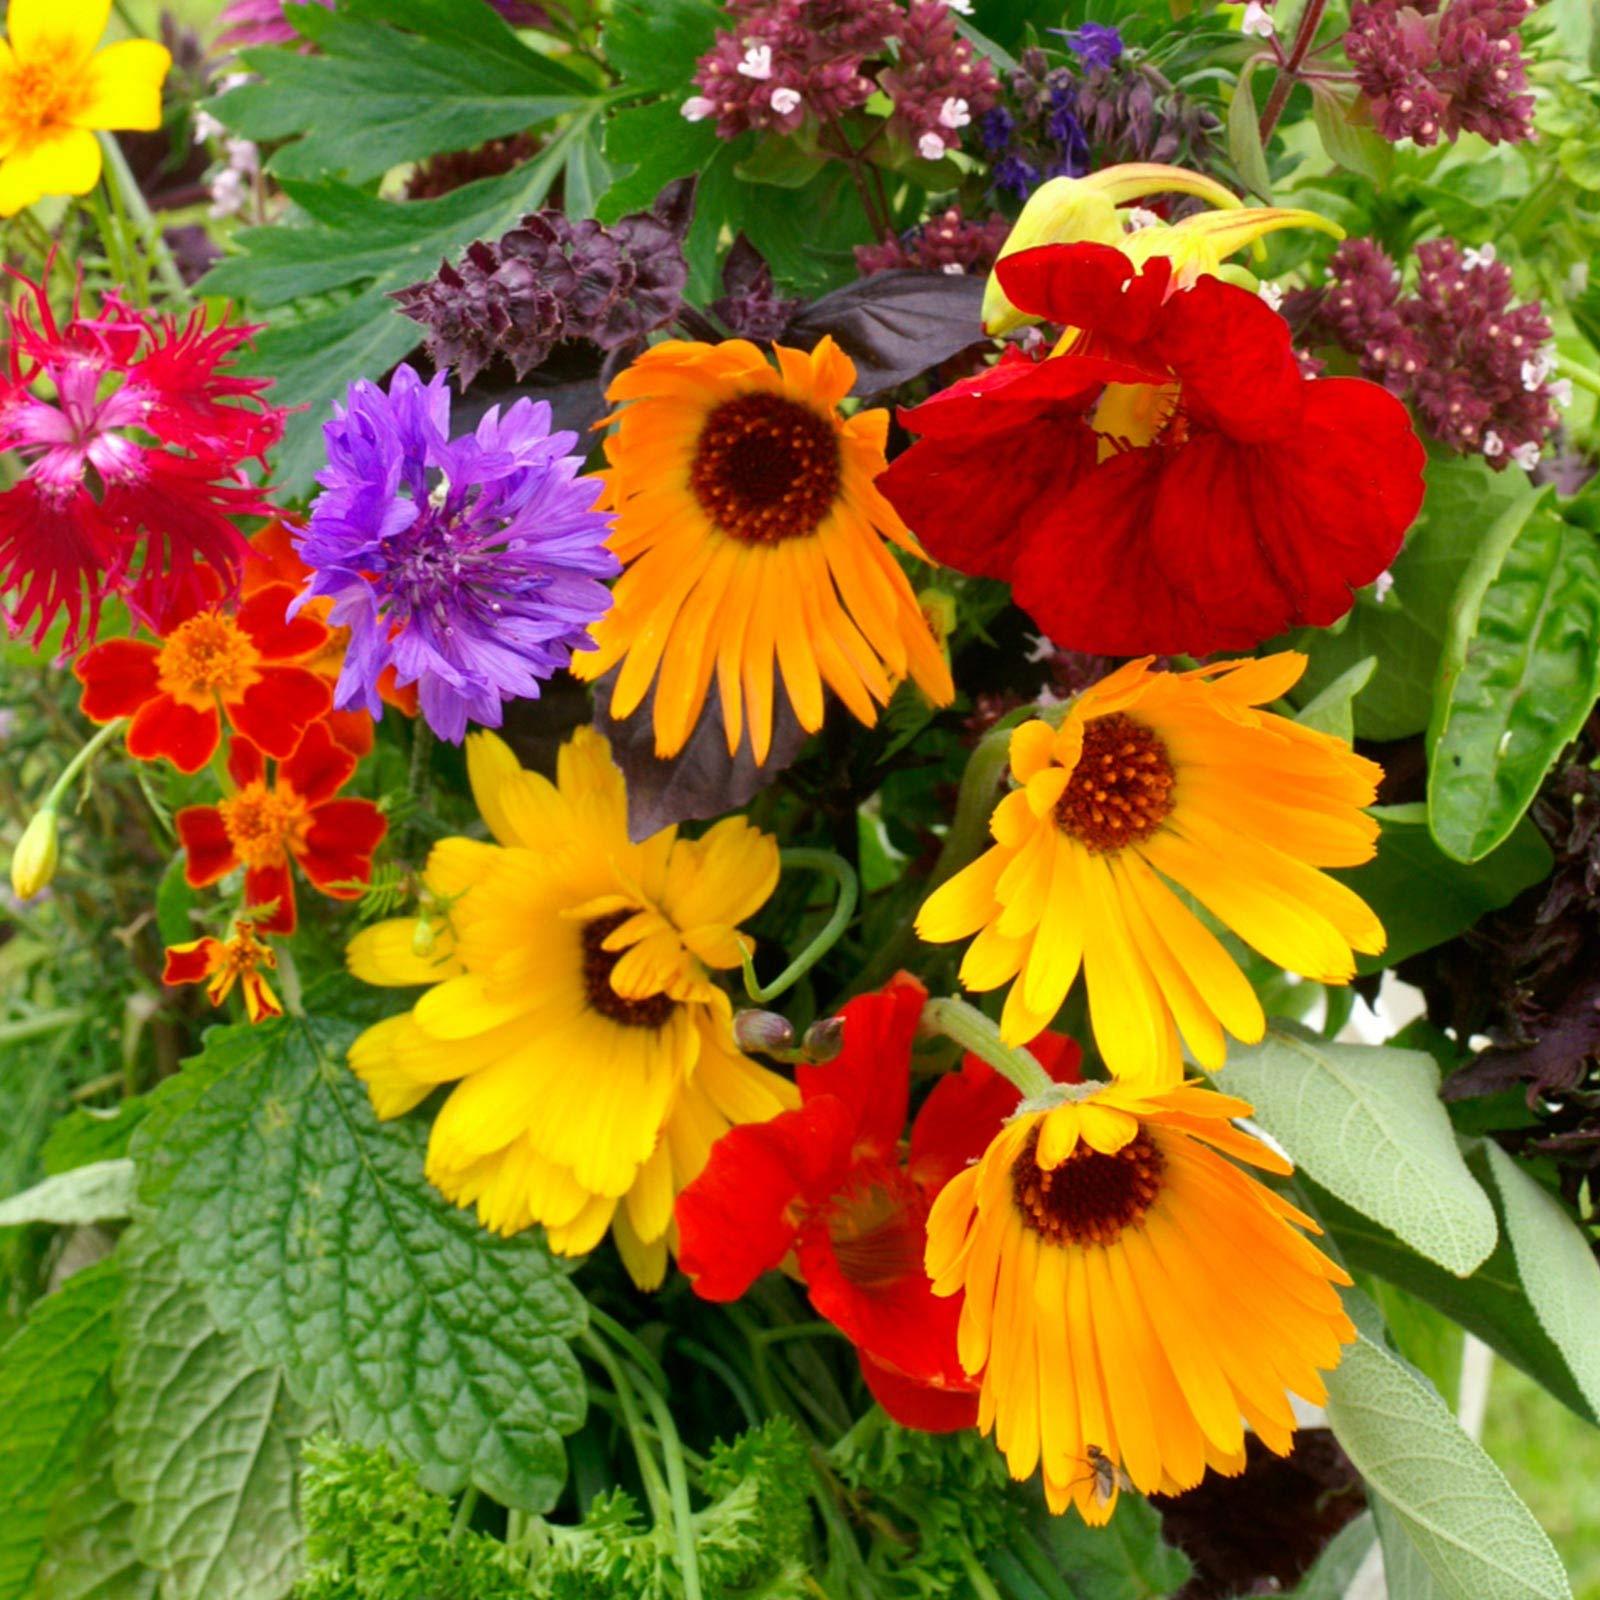 Edible Flower Garden Seed Mix - 1 Lb Bulk - Blend of Beautiful Flowers & Wildflowers: Lovage, Signet Marigold, Hyssop, Nasturtium, Spearmint & More